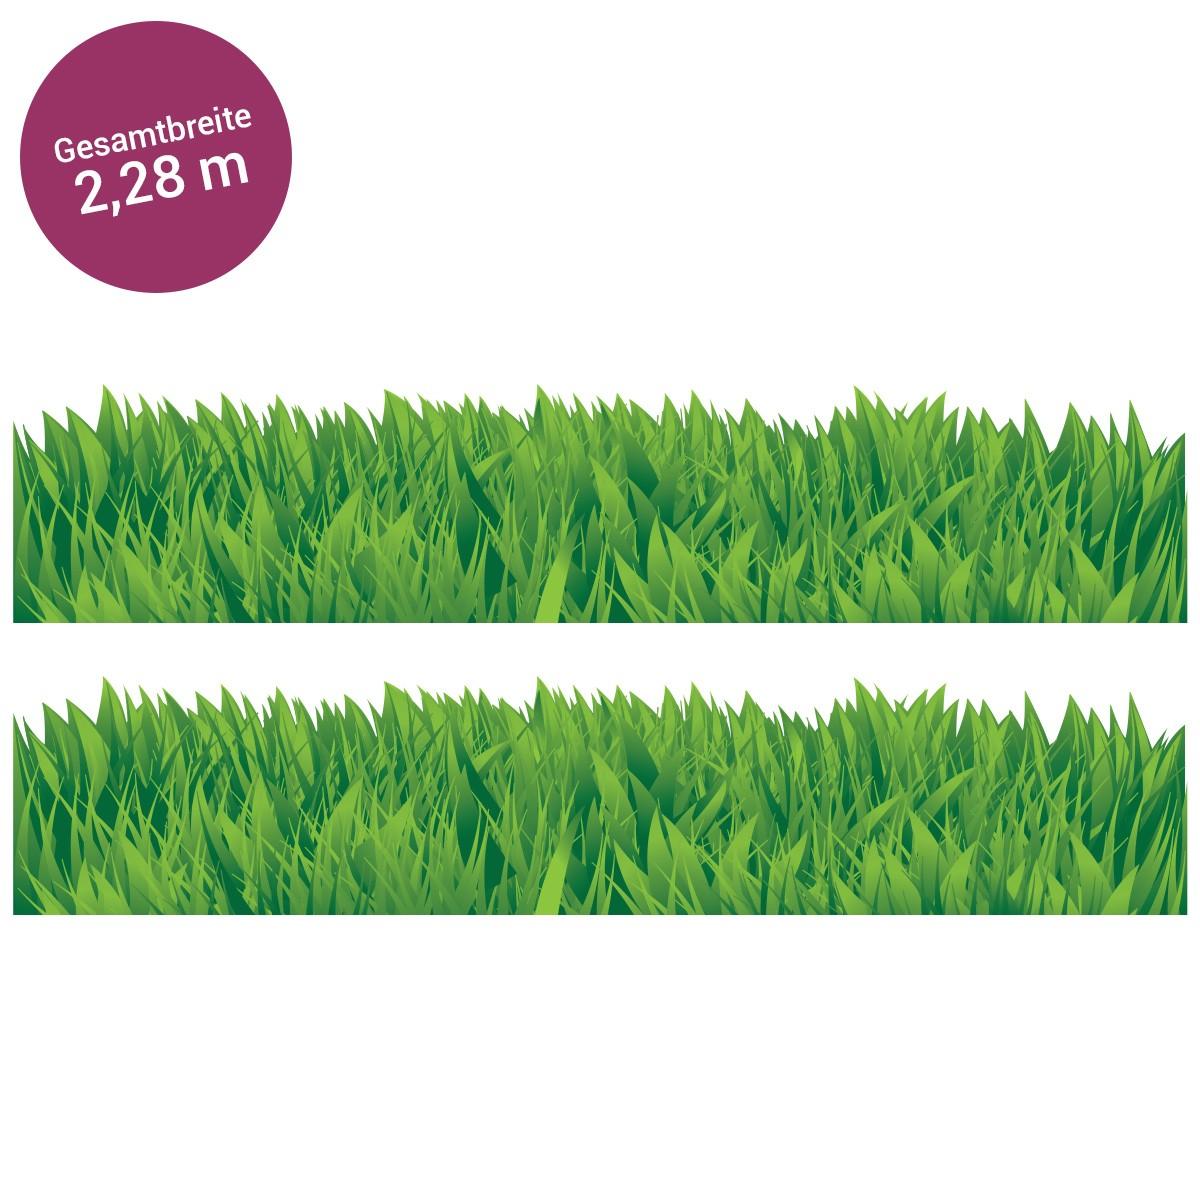 Gras bord re 2 28 m - Fliesenaufkleber gras ...